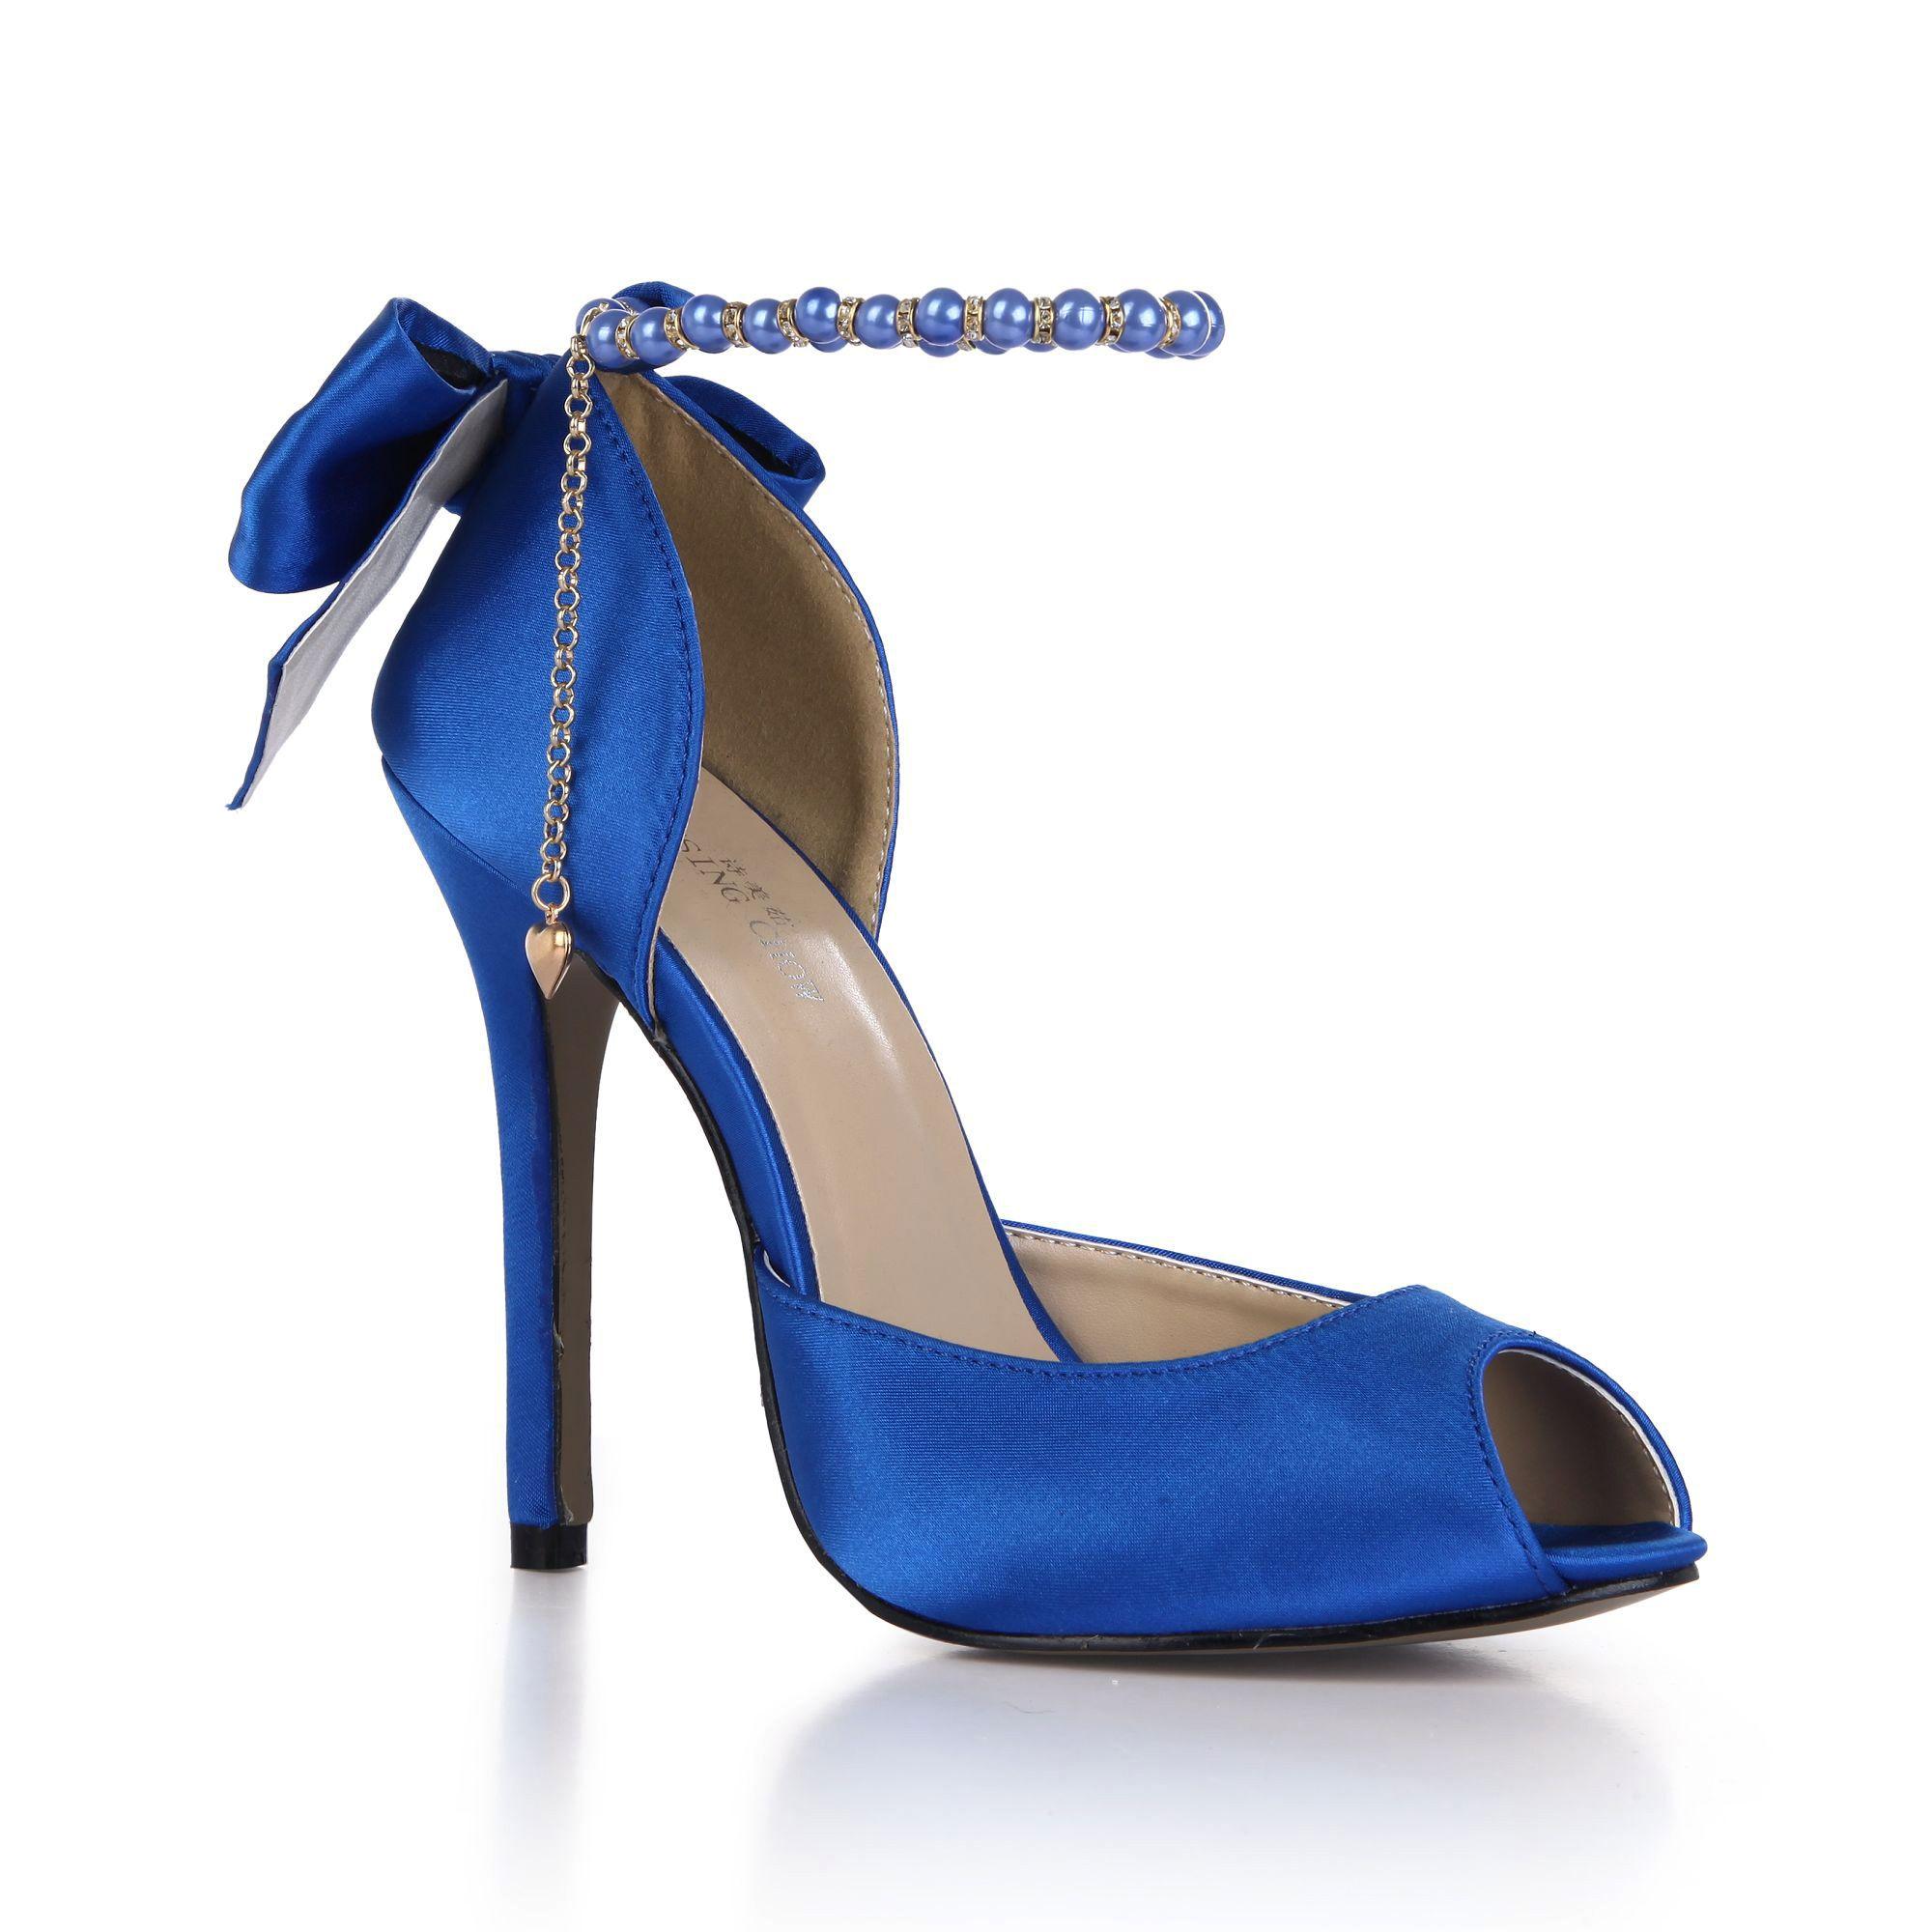 d6bc2ef1ca78 Ankle Beading Back Bowtie Party Satin Dress Sandals Elegant Bridal Wedding Shoes  Women Chain High Heels Shoes Open Toe Buckle Summer Pumps Sandals For Men  ...